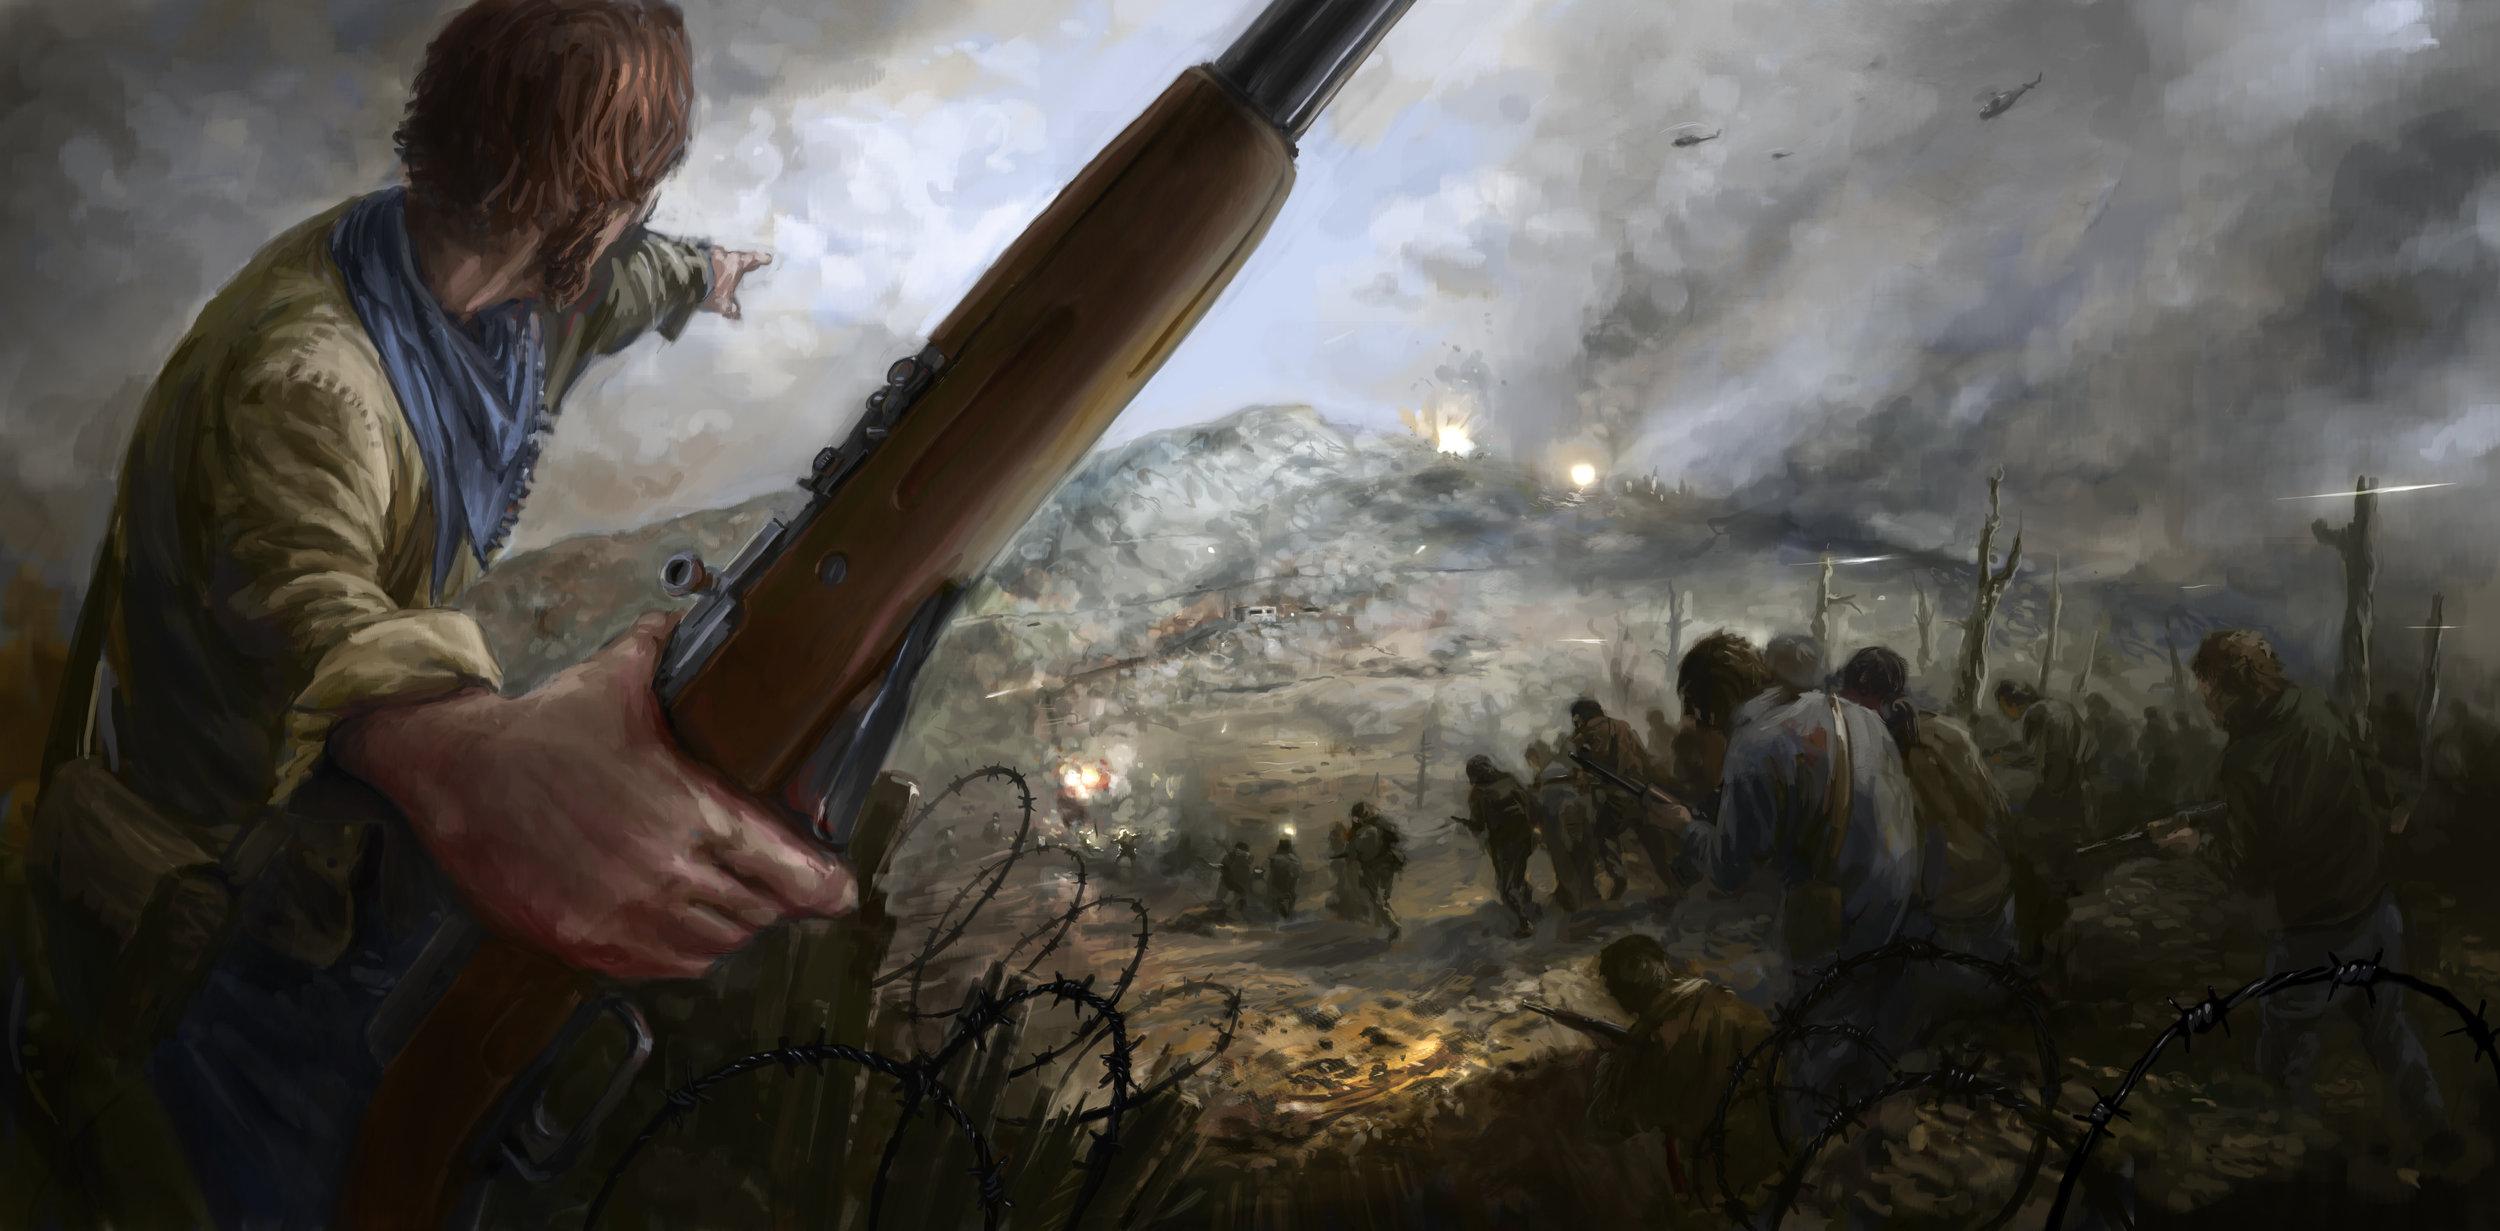 Capture the Hill by  Filip Storch.  https://skvor.deviantart.com/